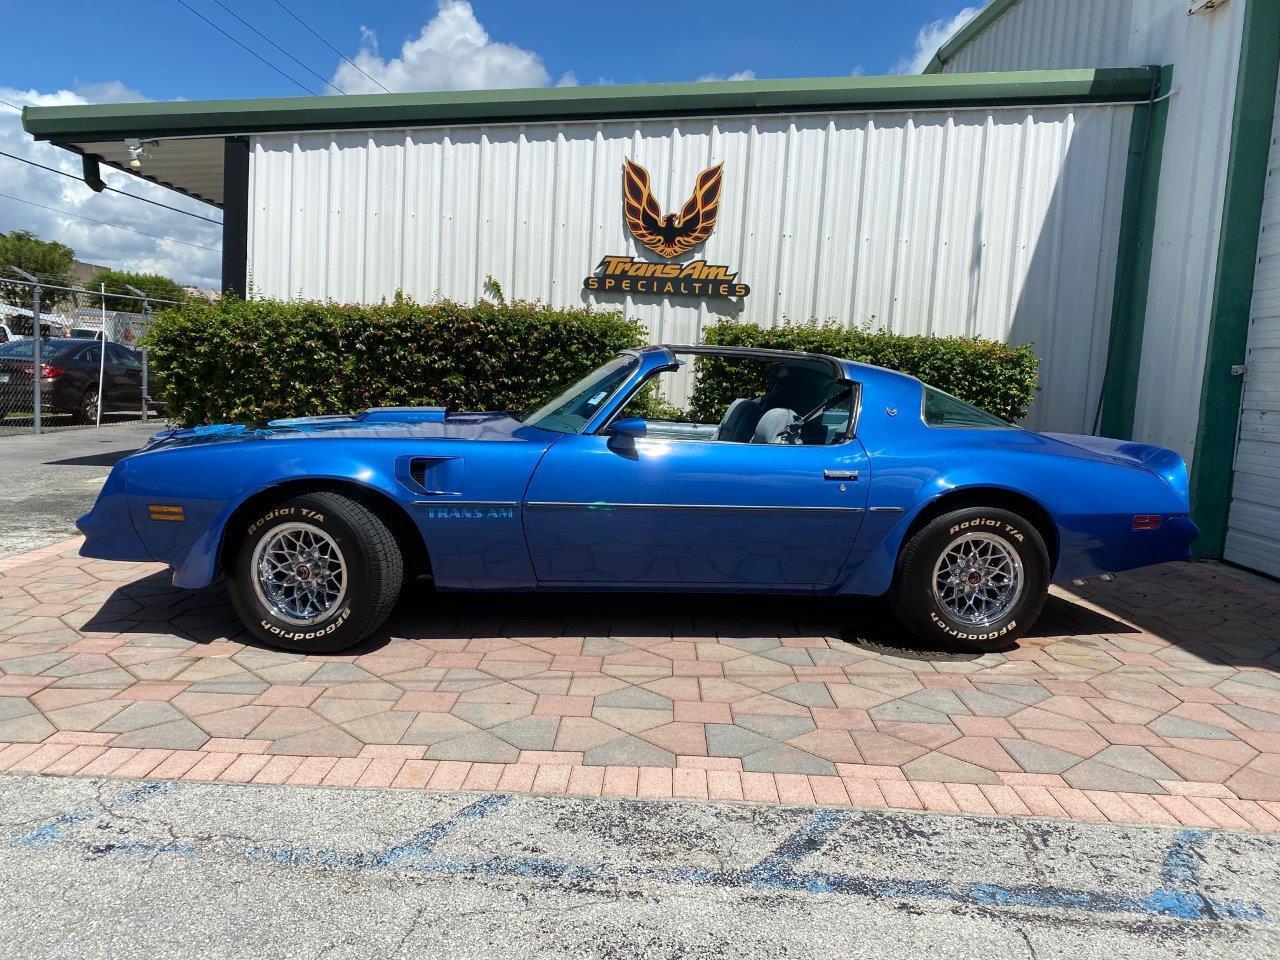 1978 Pontiac Firebird Trans Am WS6 (CC-1411996) for sale in Miami, Florida